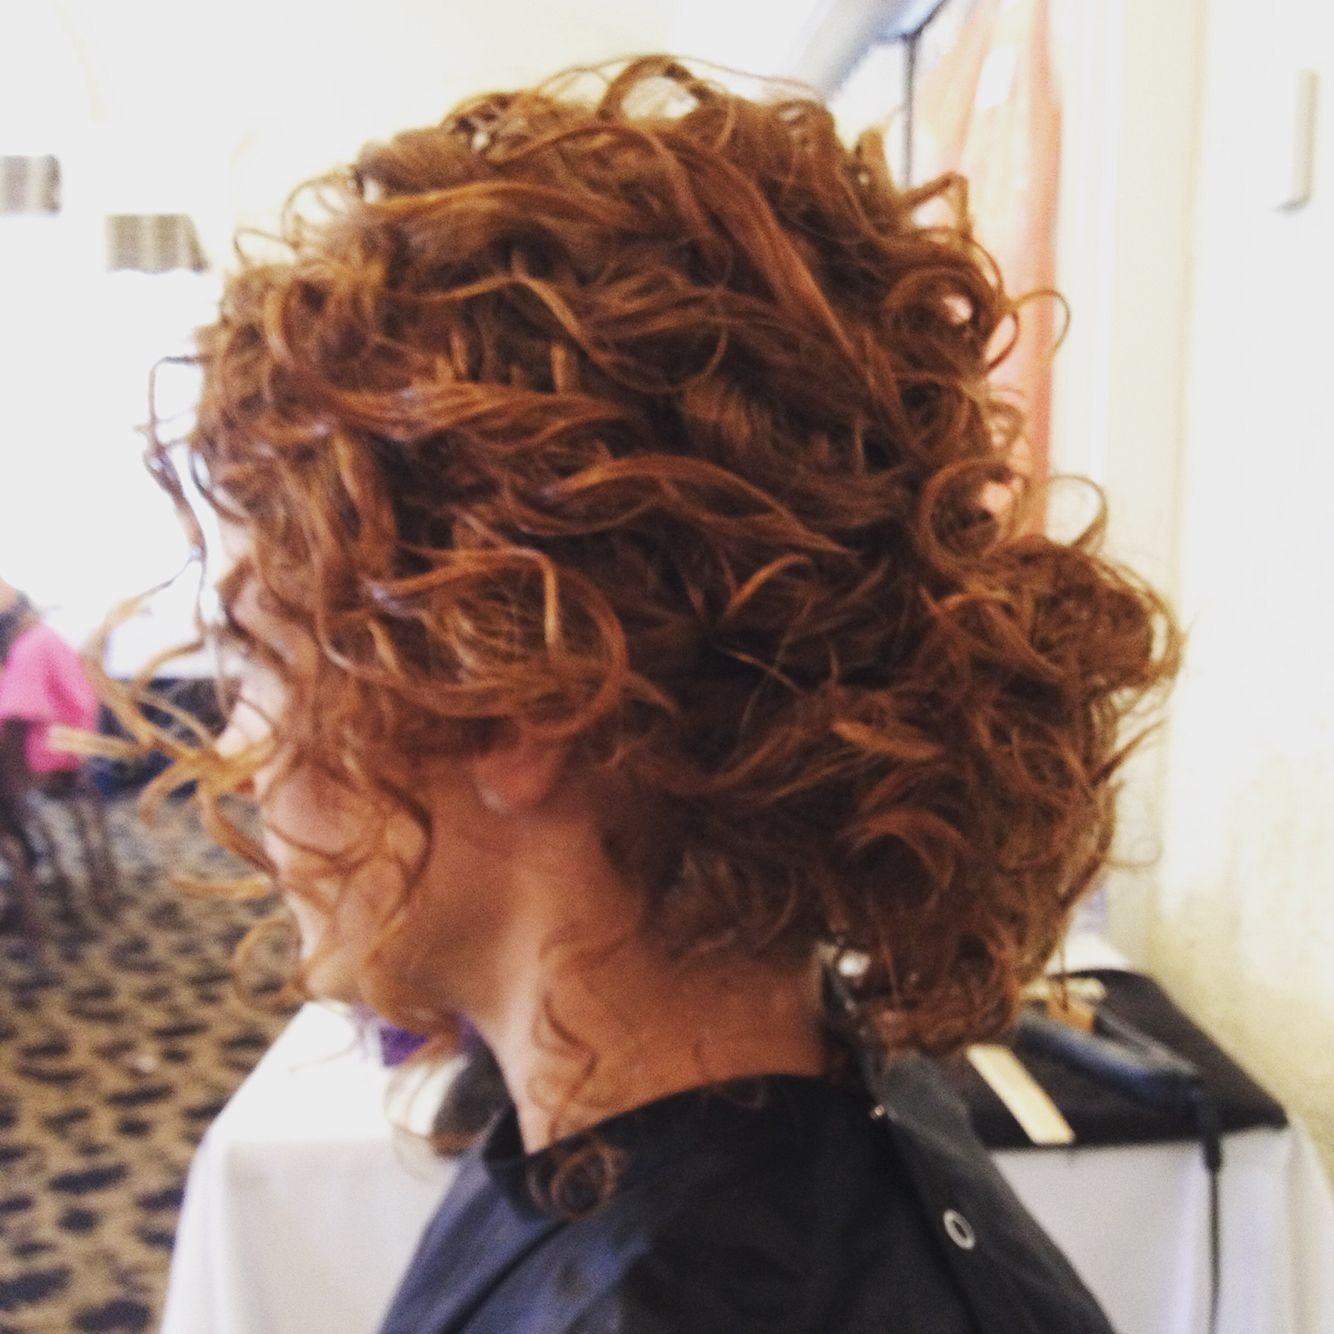 Naturally curly hair low bun updo  hair  Curly hair